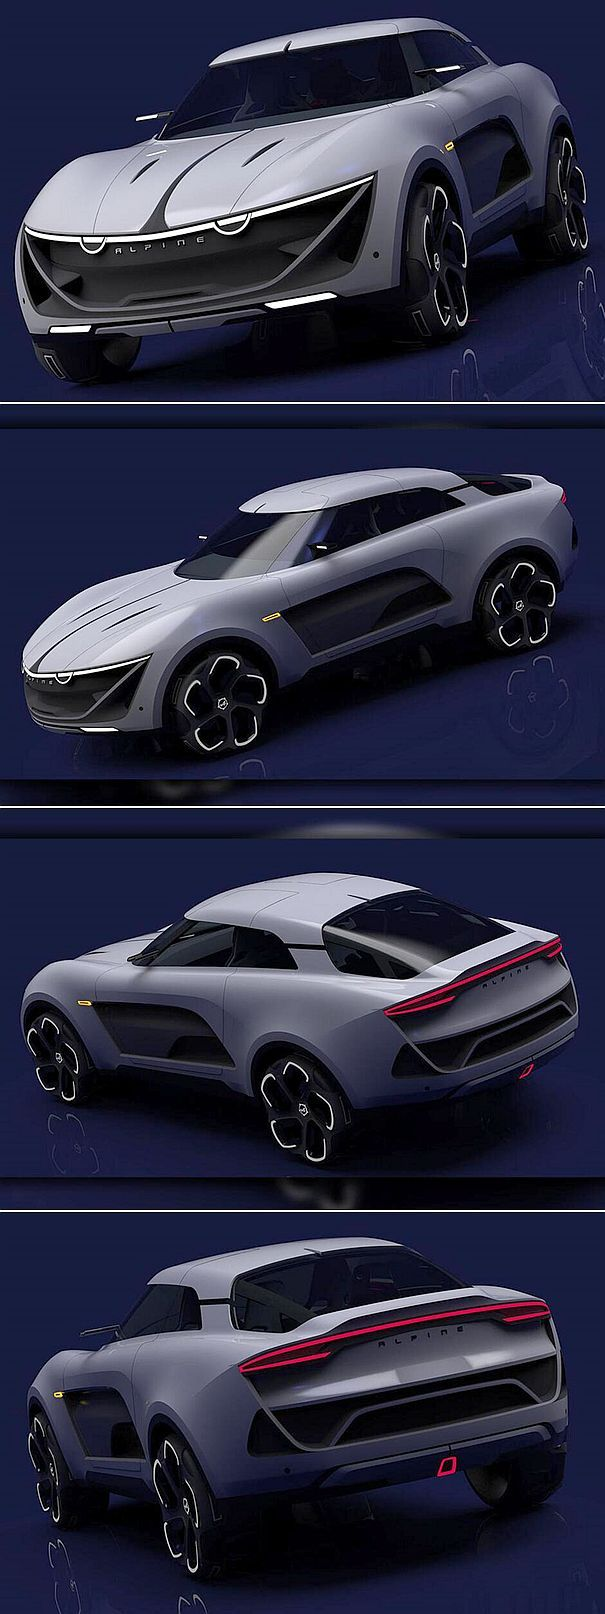 Alpine suv 2025 concept crossover rashid tagirov